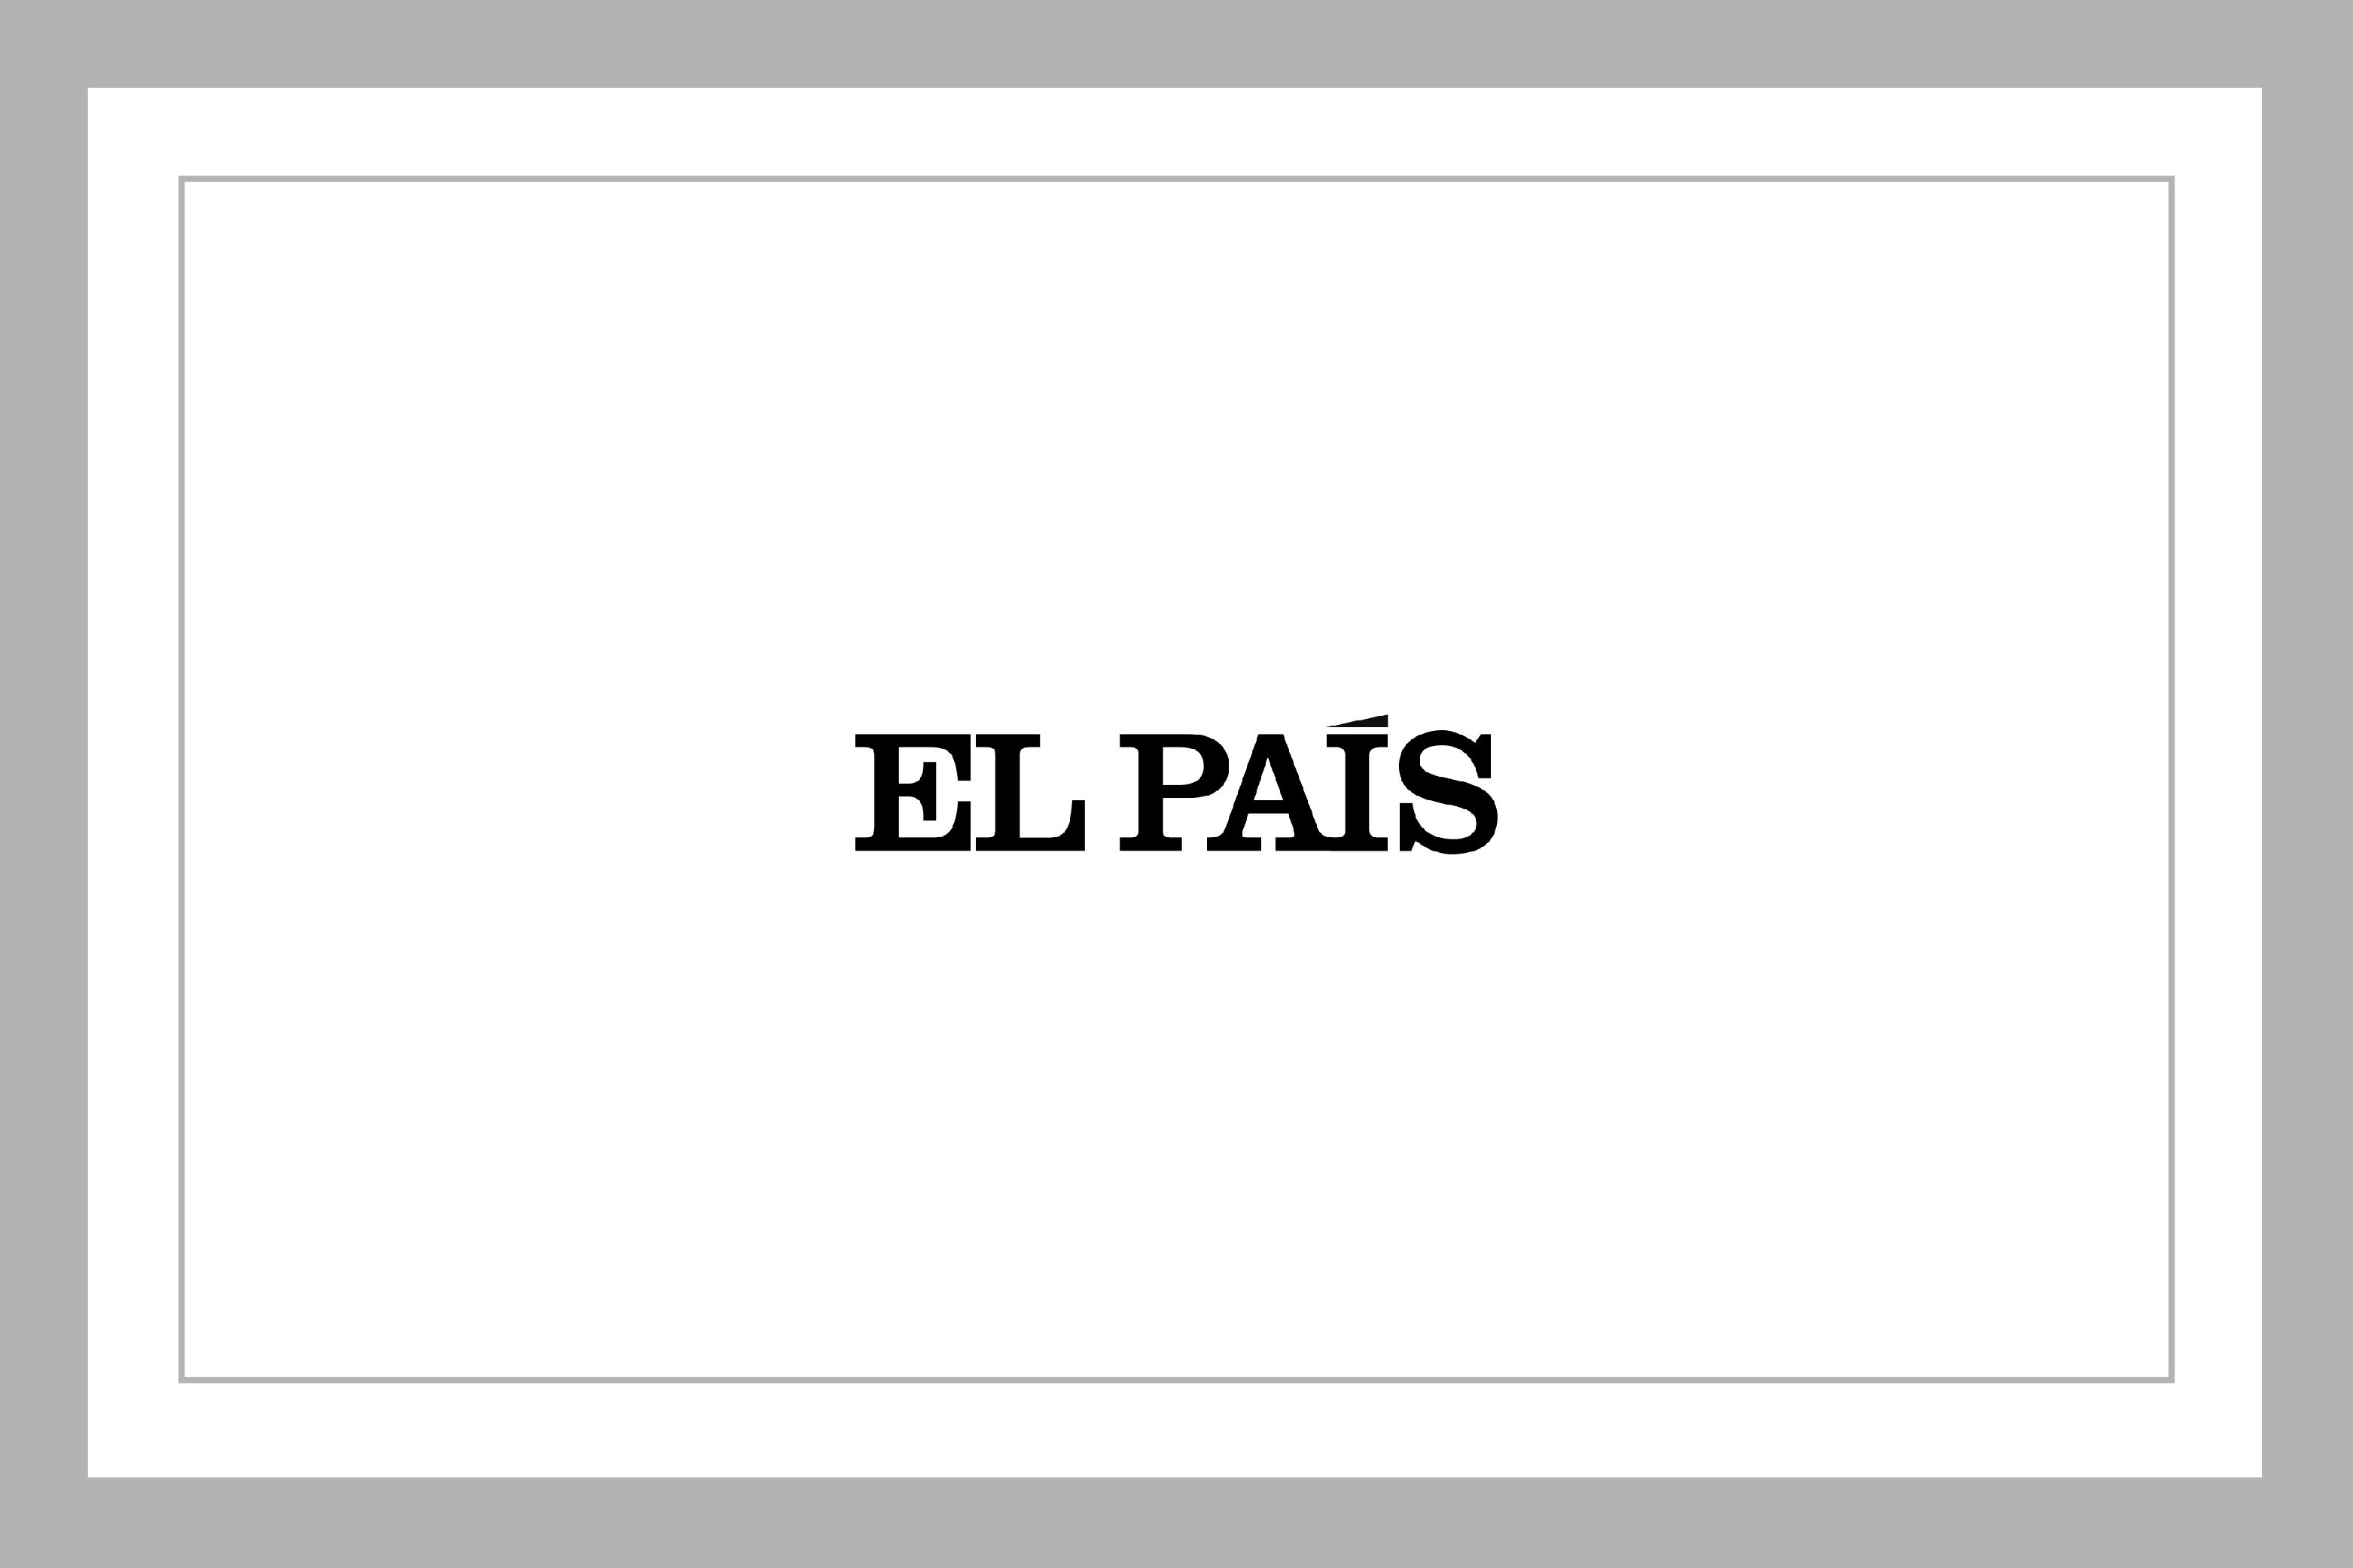 destacada prensa el País Félix ramiro